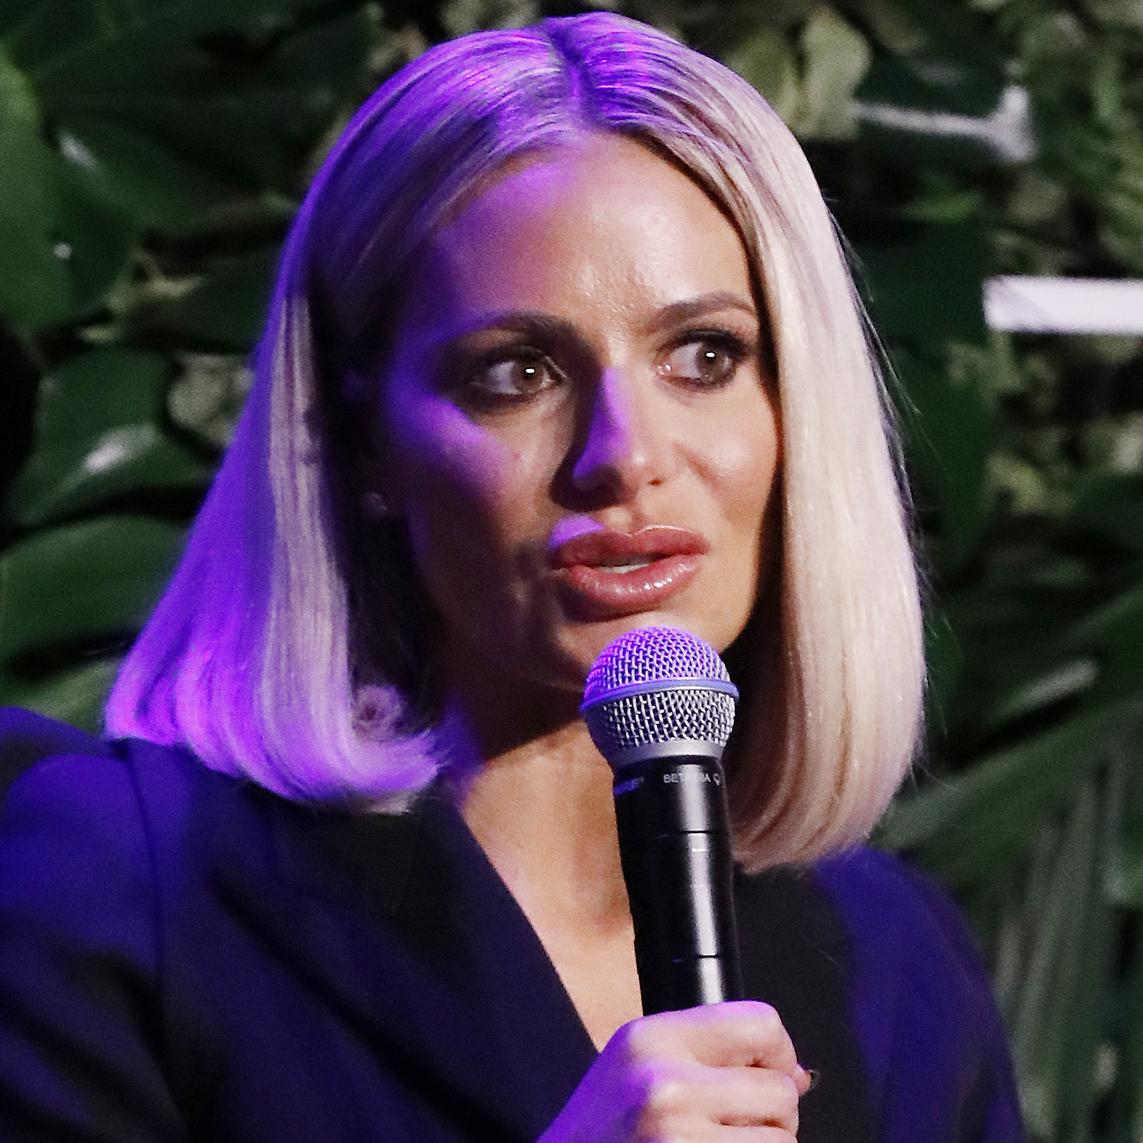 Dorit Kemsley's net worth: $50 million